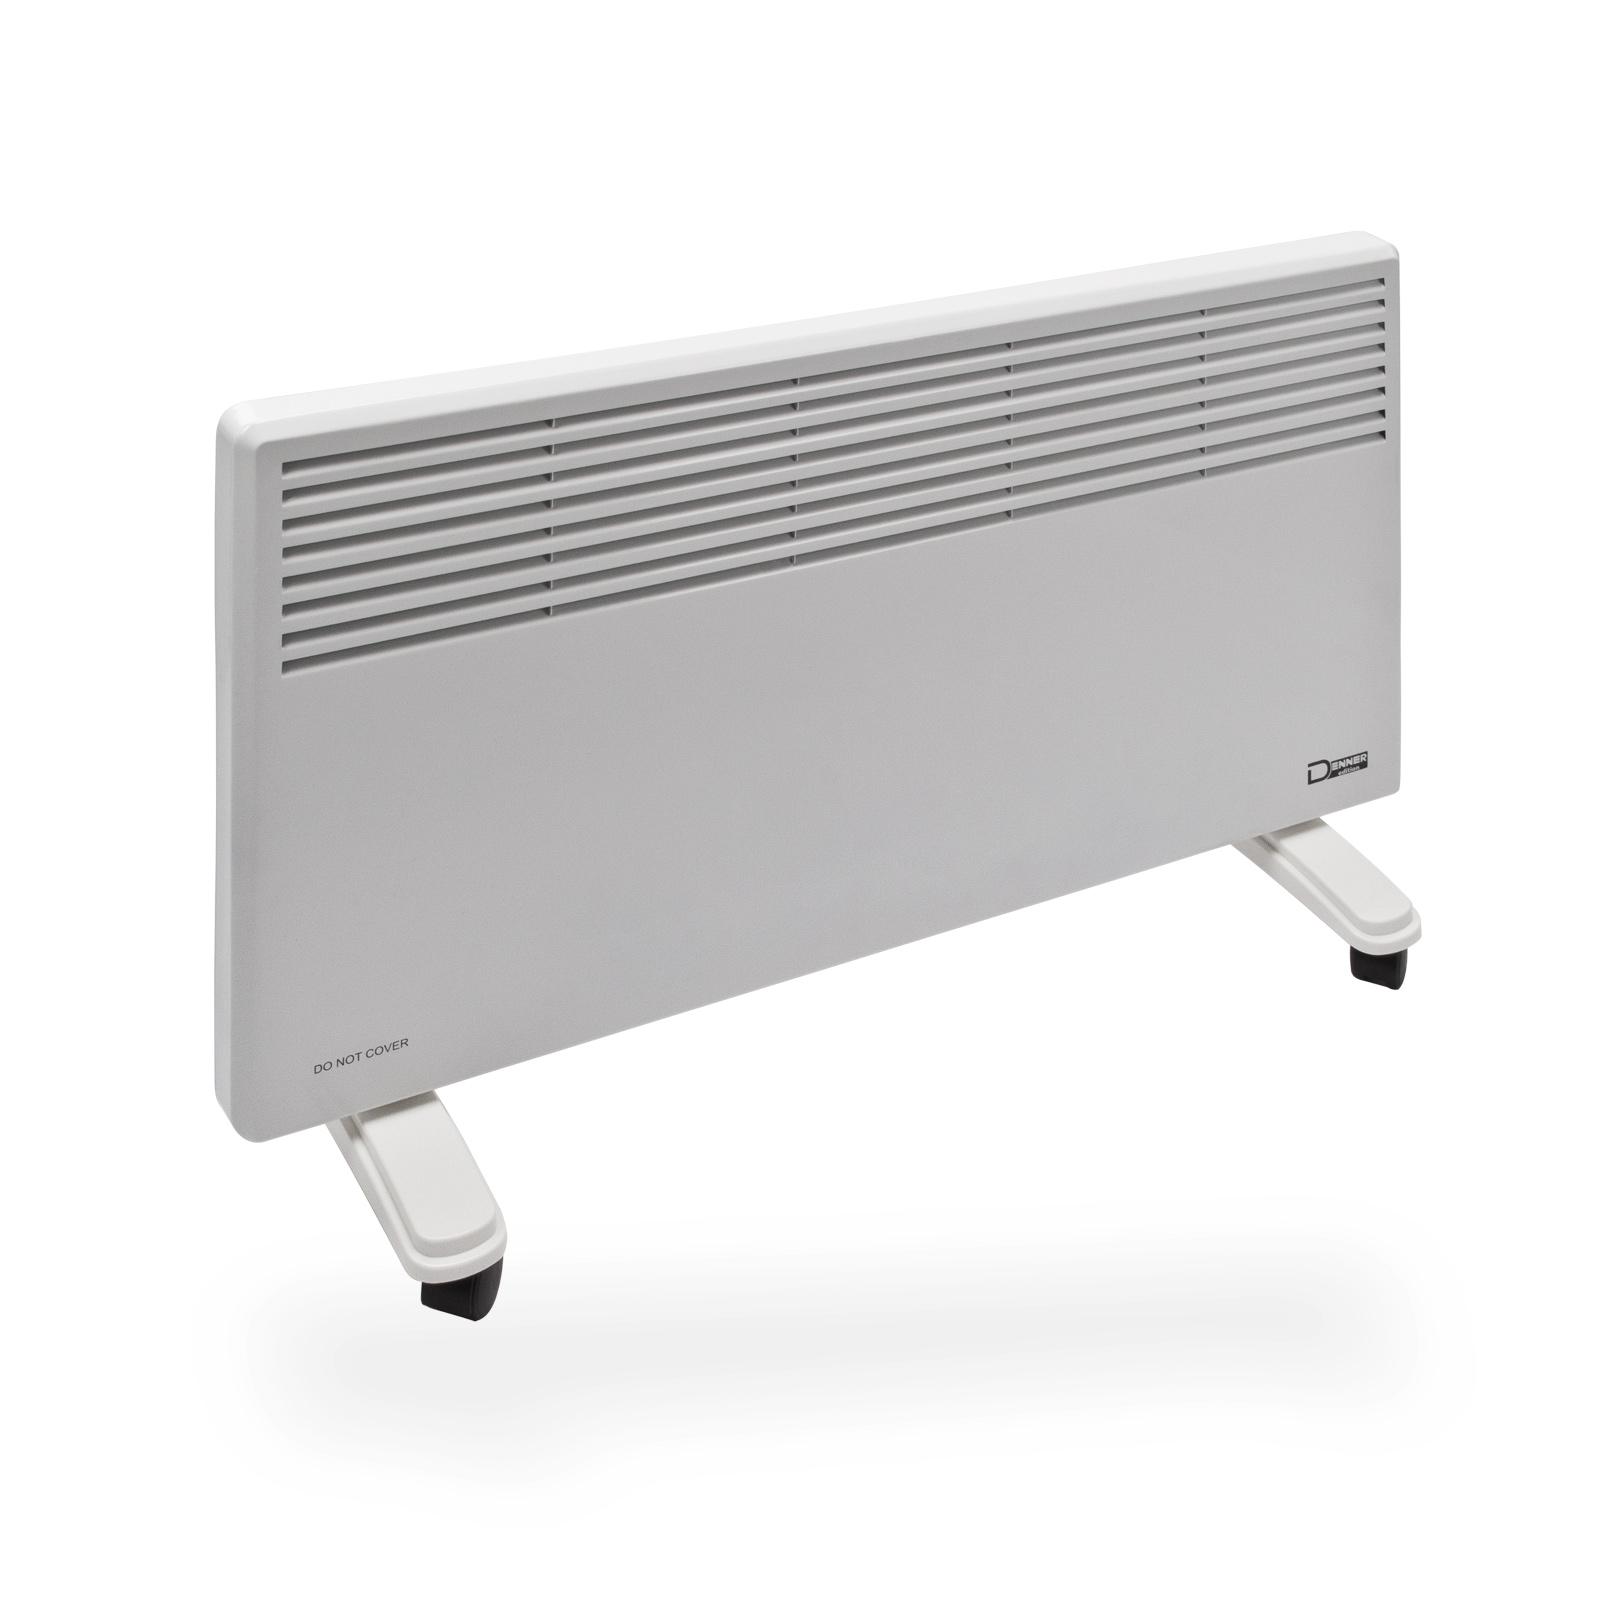 konvektor heizk rper elektroheizung rh 2000w. Black Bedroom Furniture Sets. Home Design Ideas